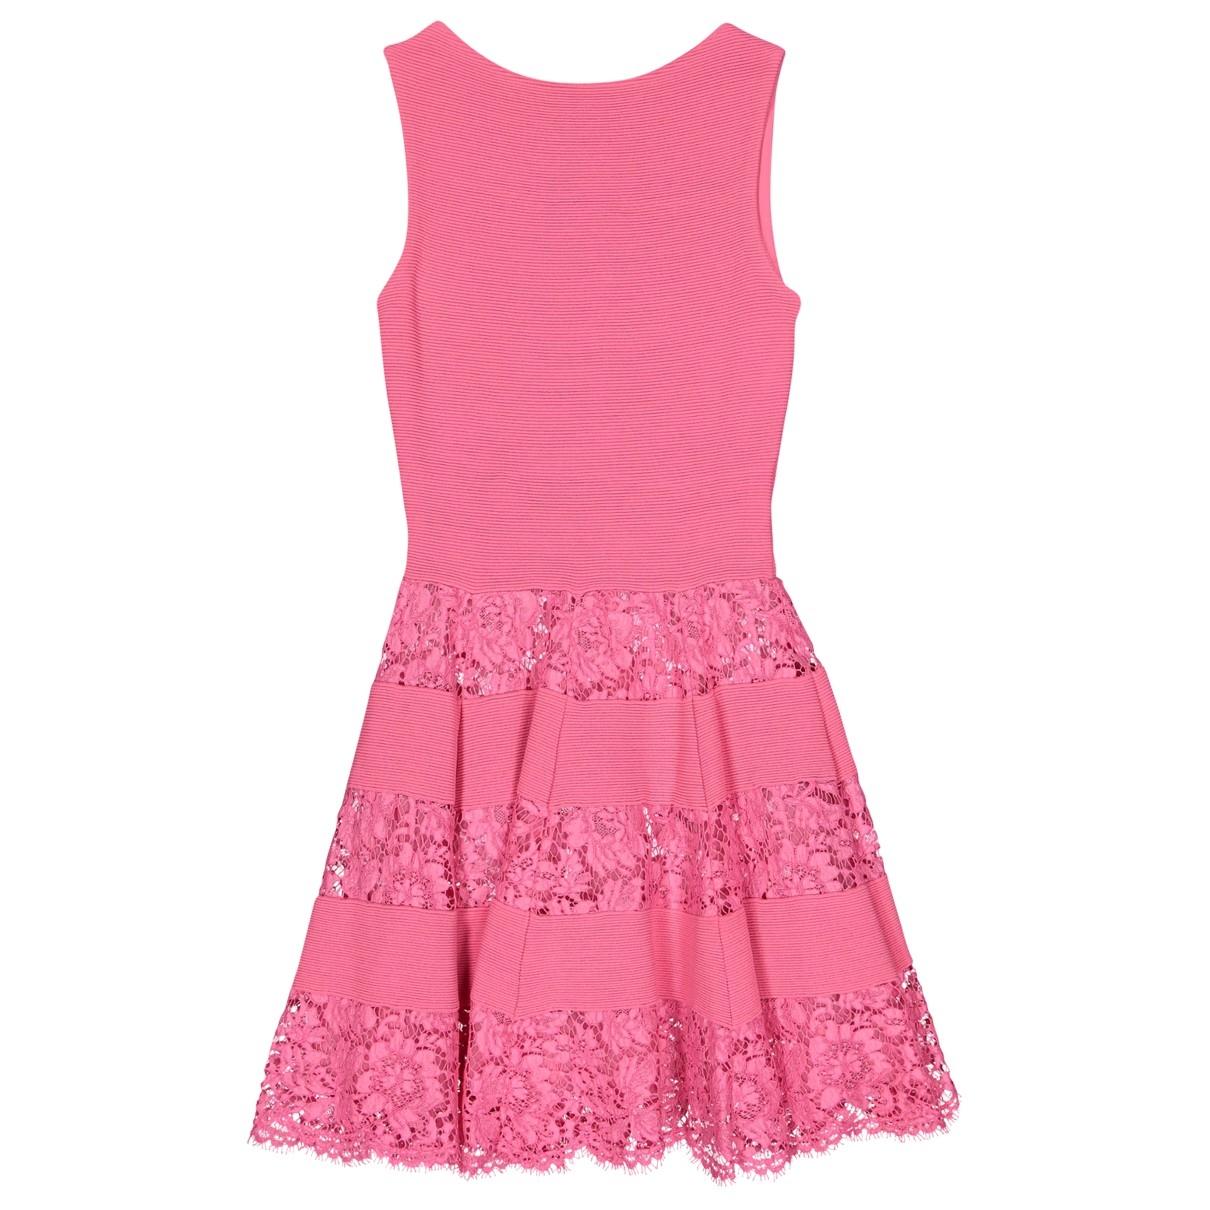 Valentino Garavani \N Pink dress for Women S International